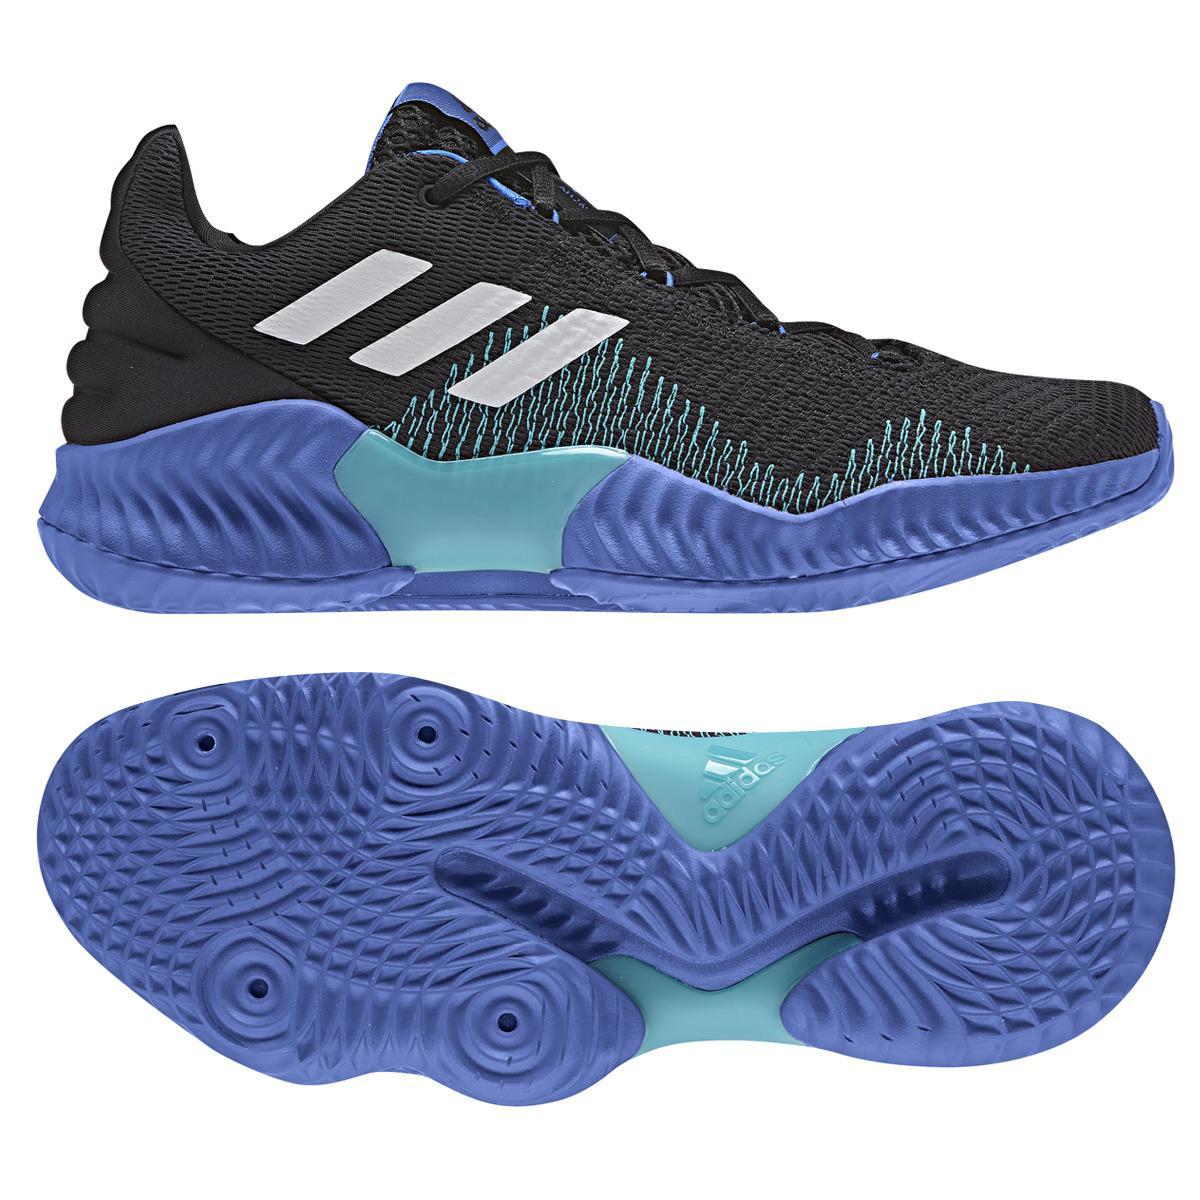 1c57ec7337fe8 Adidas - Blue Pro Bounce 2018 Low Basketball Shoes for Men - Lyst. View  fullscreen